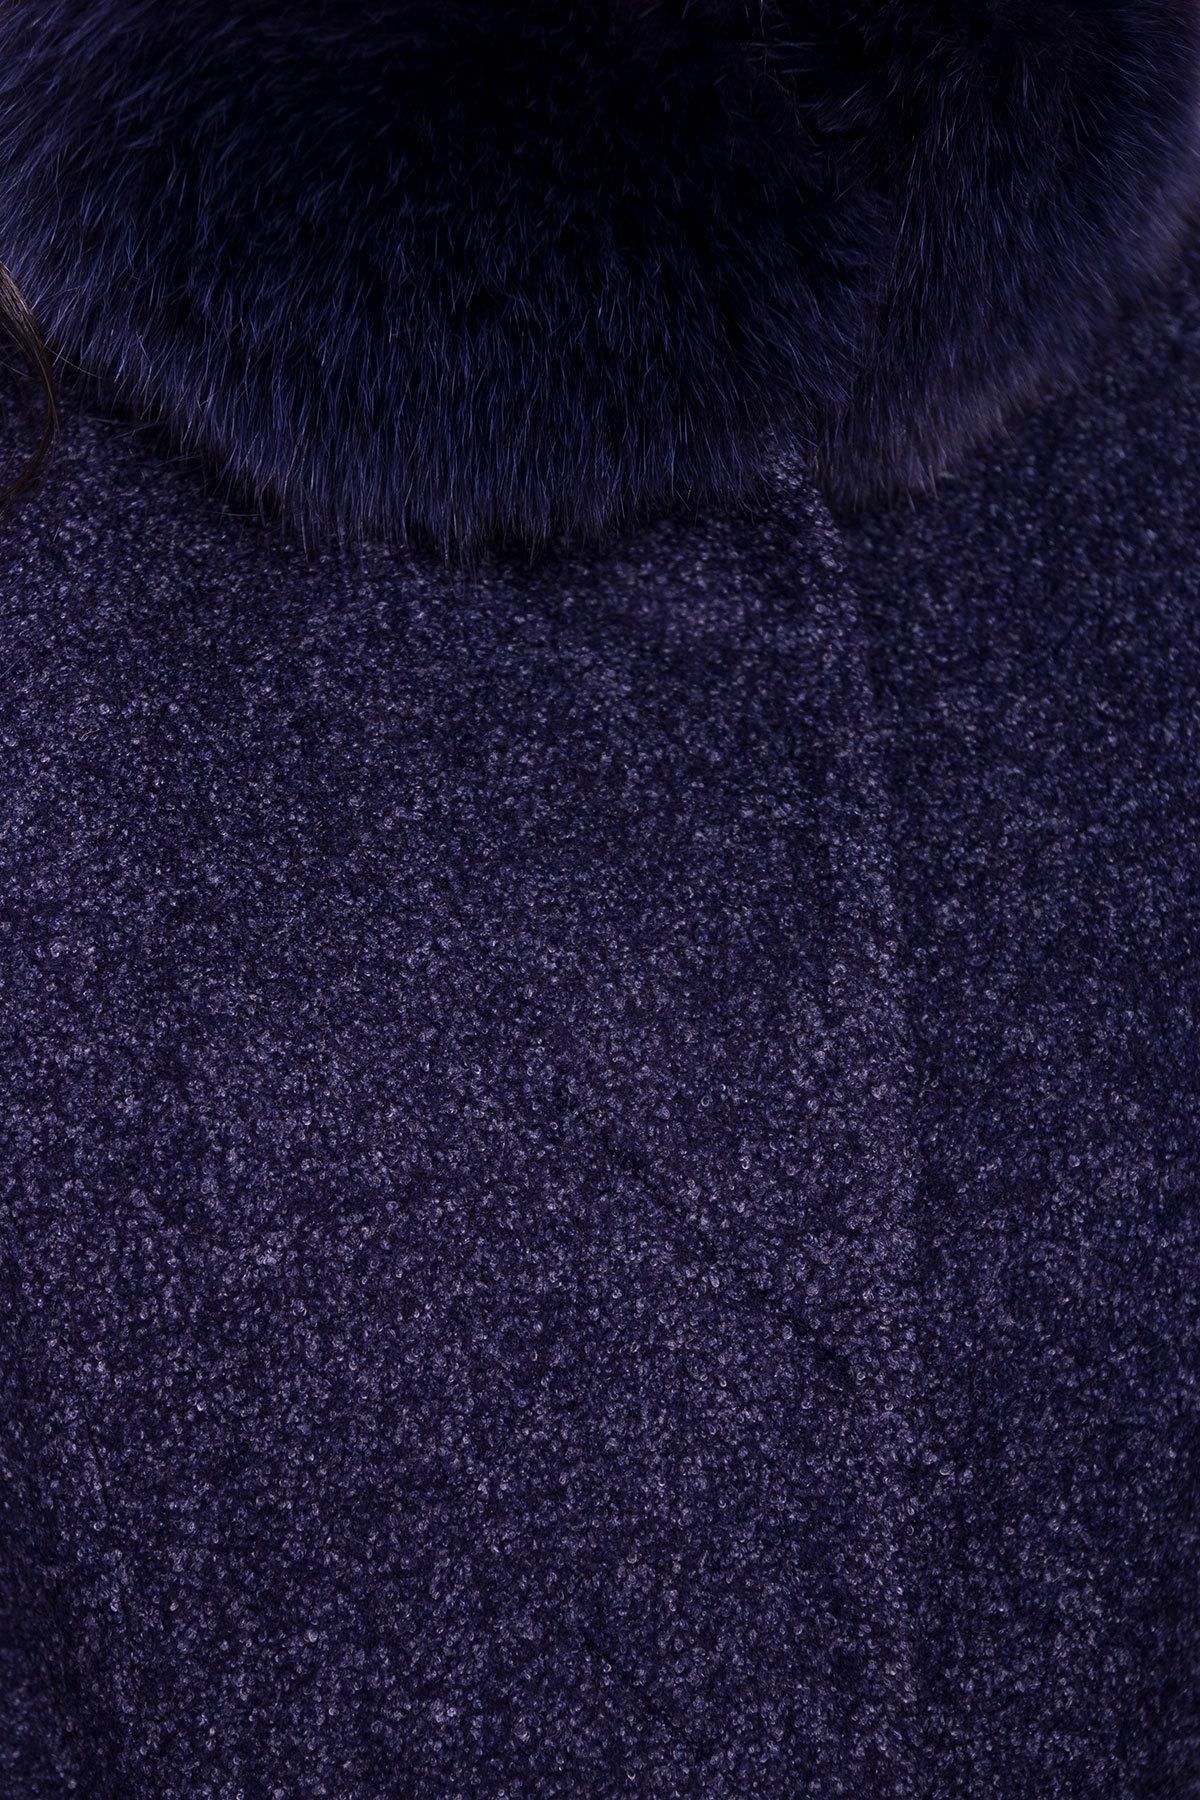 Пальто зима Сплит 3359 АРТ. 18862 Цвет: Темно-синий - фото 5, интернет магазин tm-modus.ru